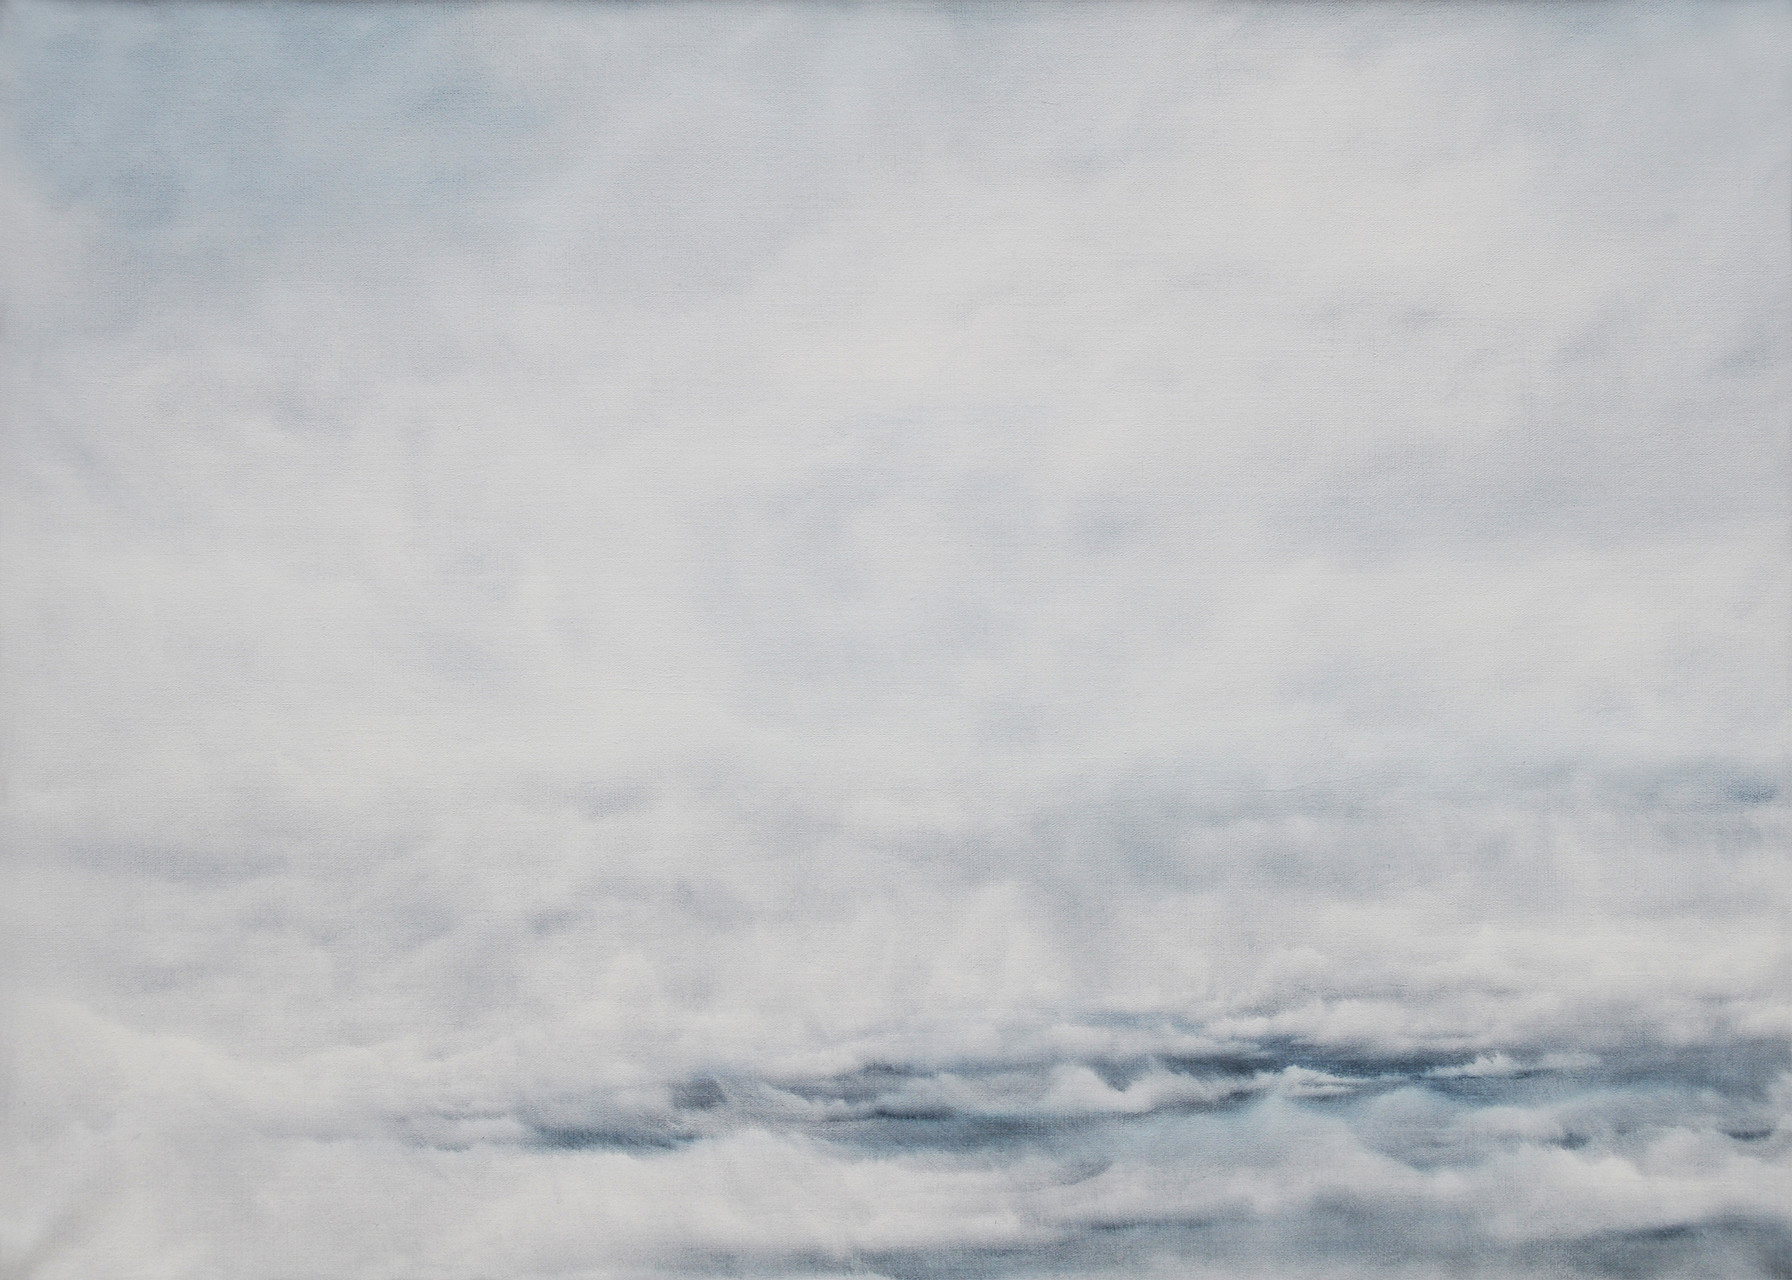 KOMPOSITION IN GRAUBLAU, 2014, Öl/Lwd., 100 x 140cm